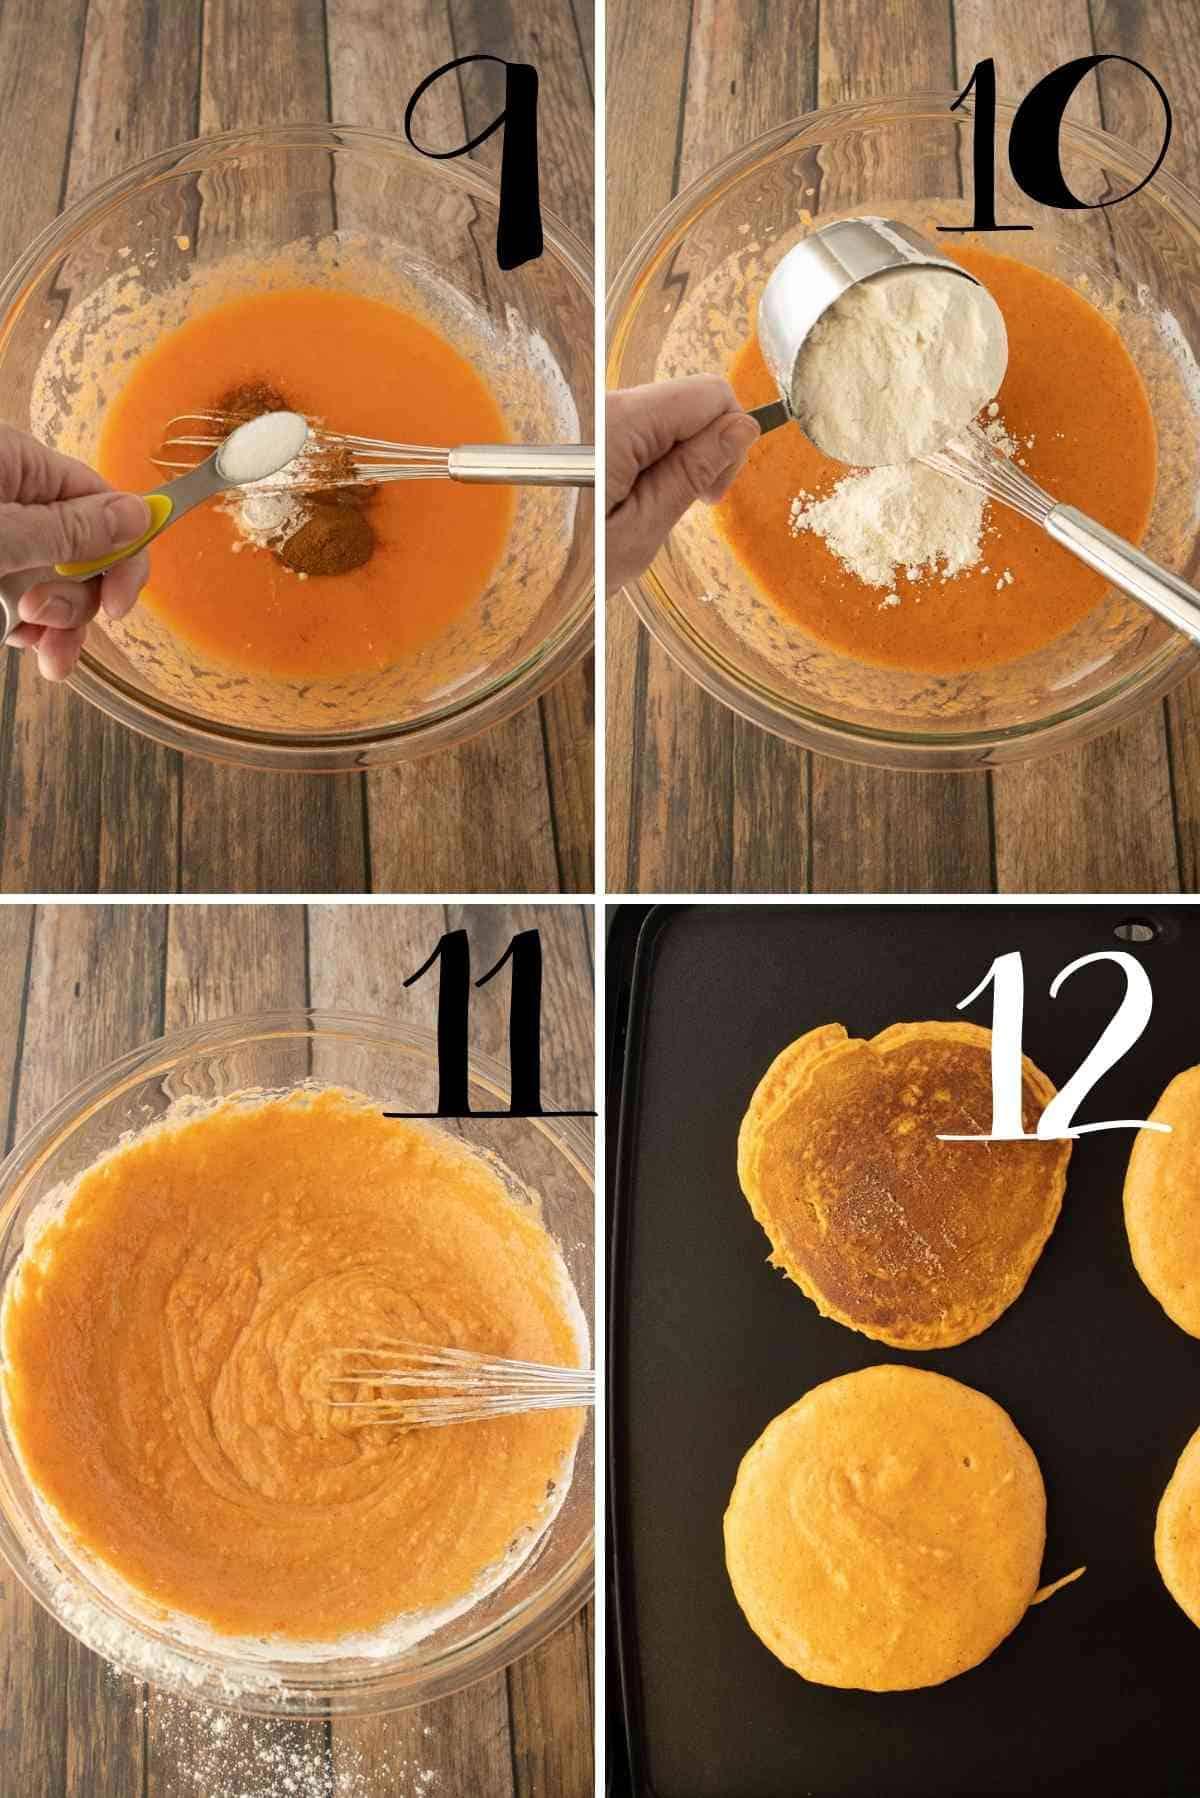 Add salt and flour.  Cook on a griddle.